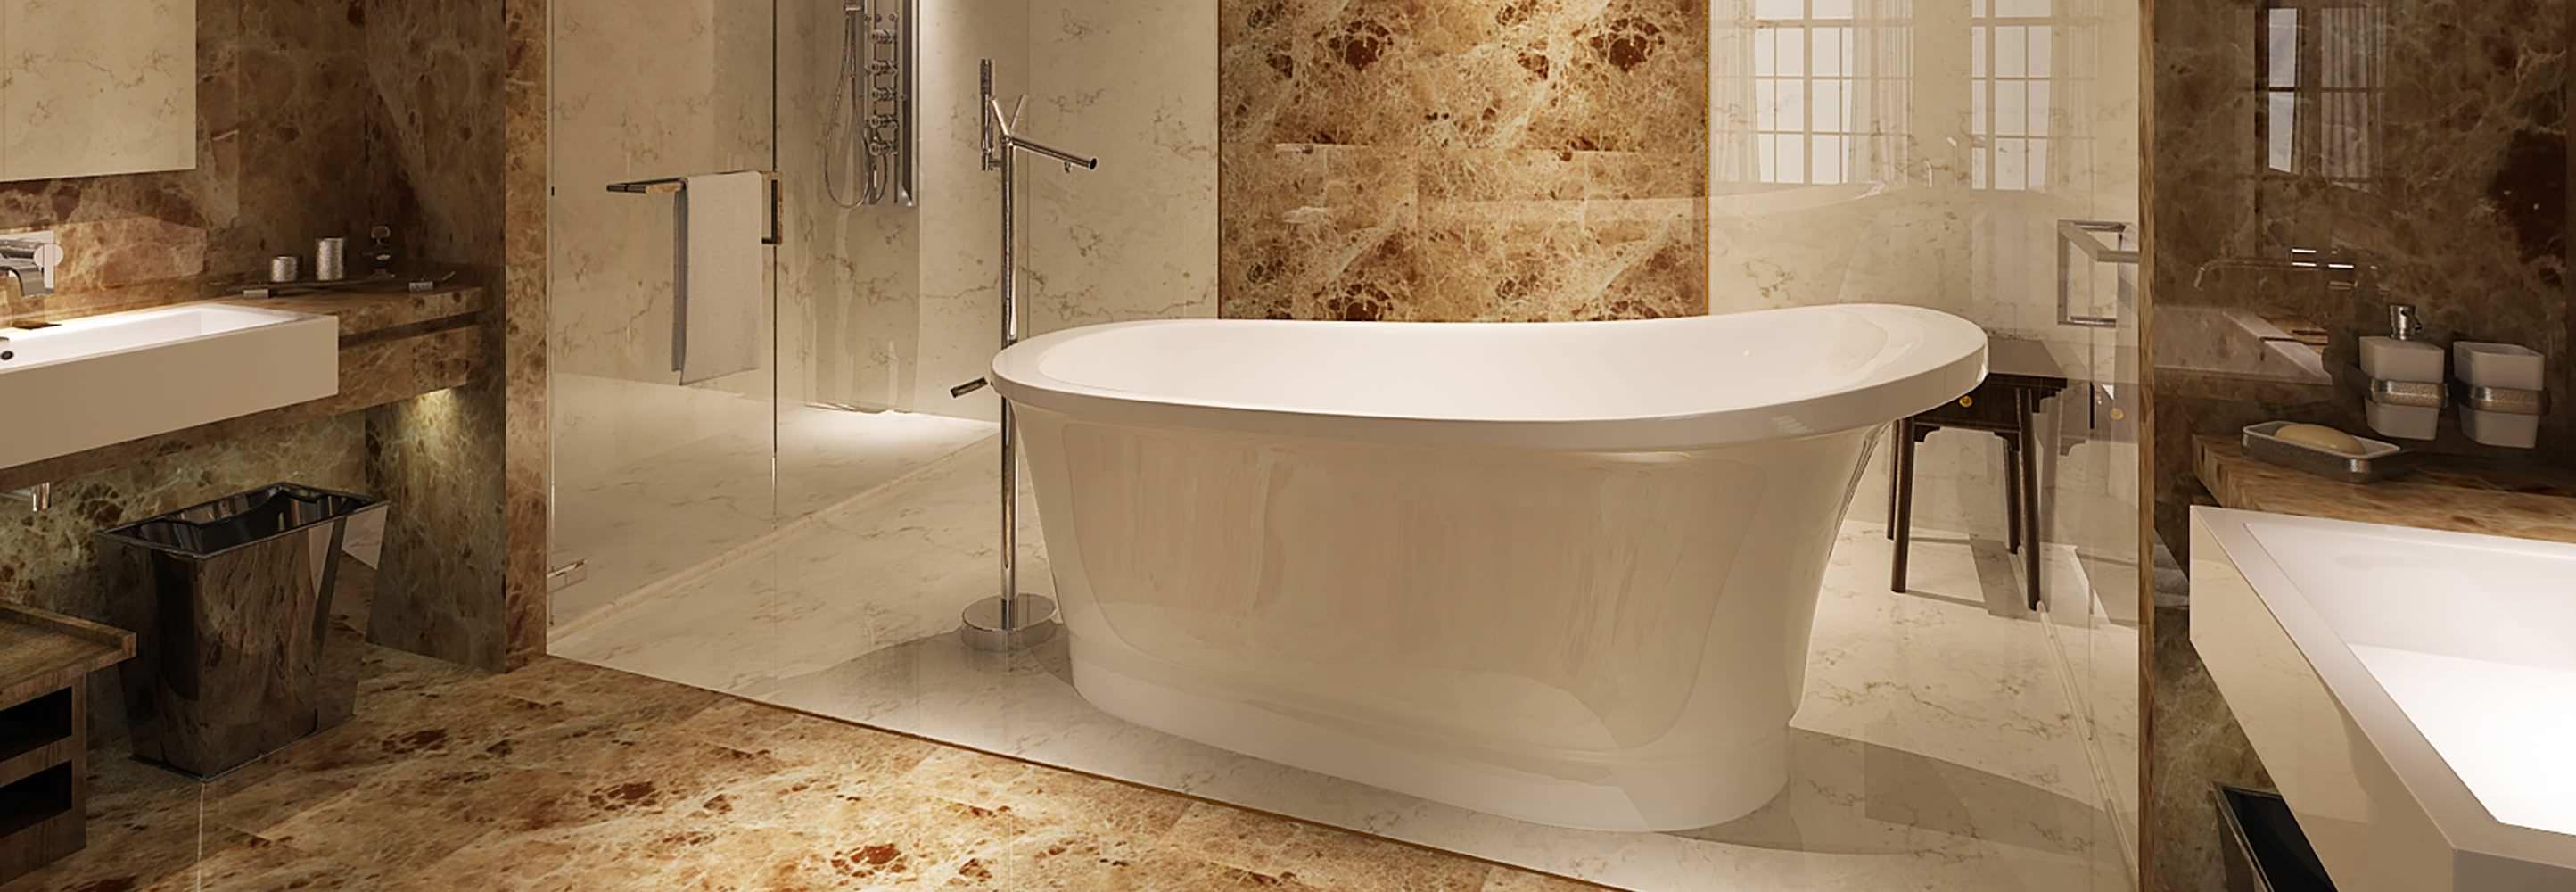 HelixBath Olympia Freestanding Pedestal Modern Tub